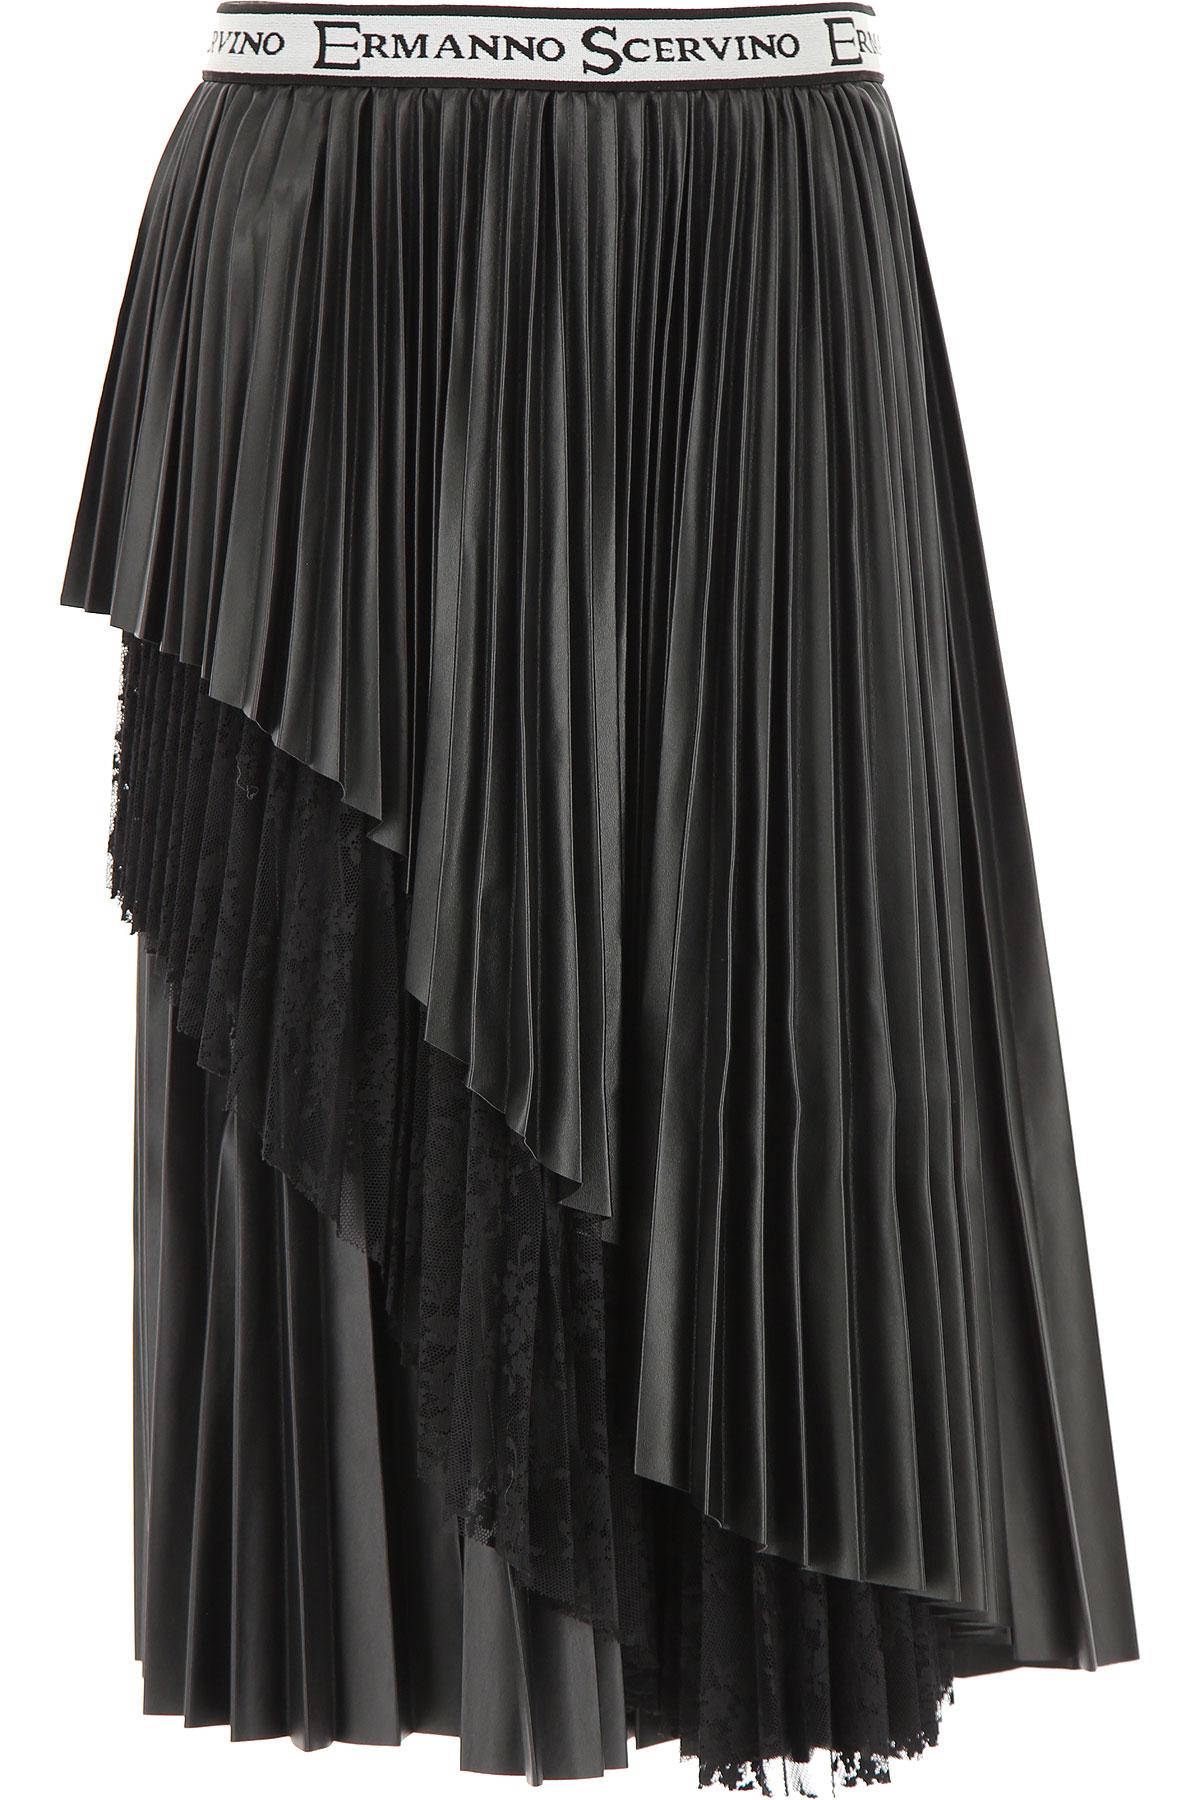 Ermanno Scervino Kids Skirts for Girls On Sale, Black, polyester, 2019, 10Y 12Y 14Y 16Y